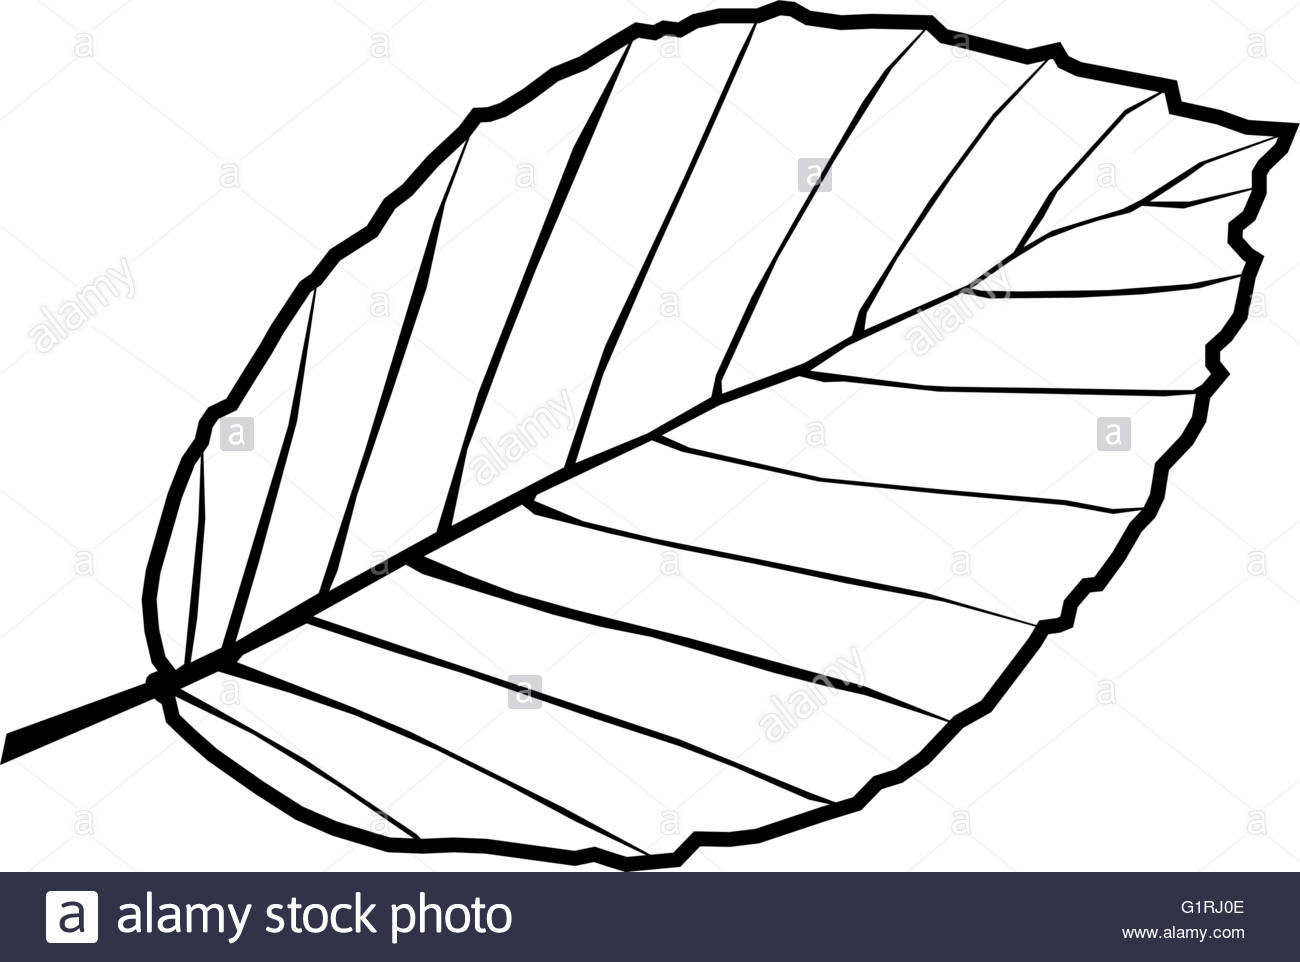 1300x962 Beech,fagus Sylvatica, Vector, Isolated Beech Leaf Stock Vector